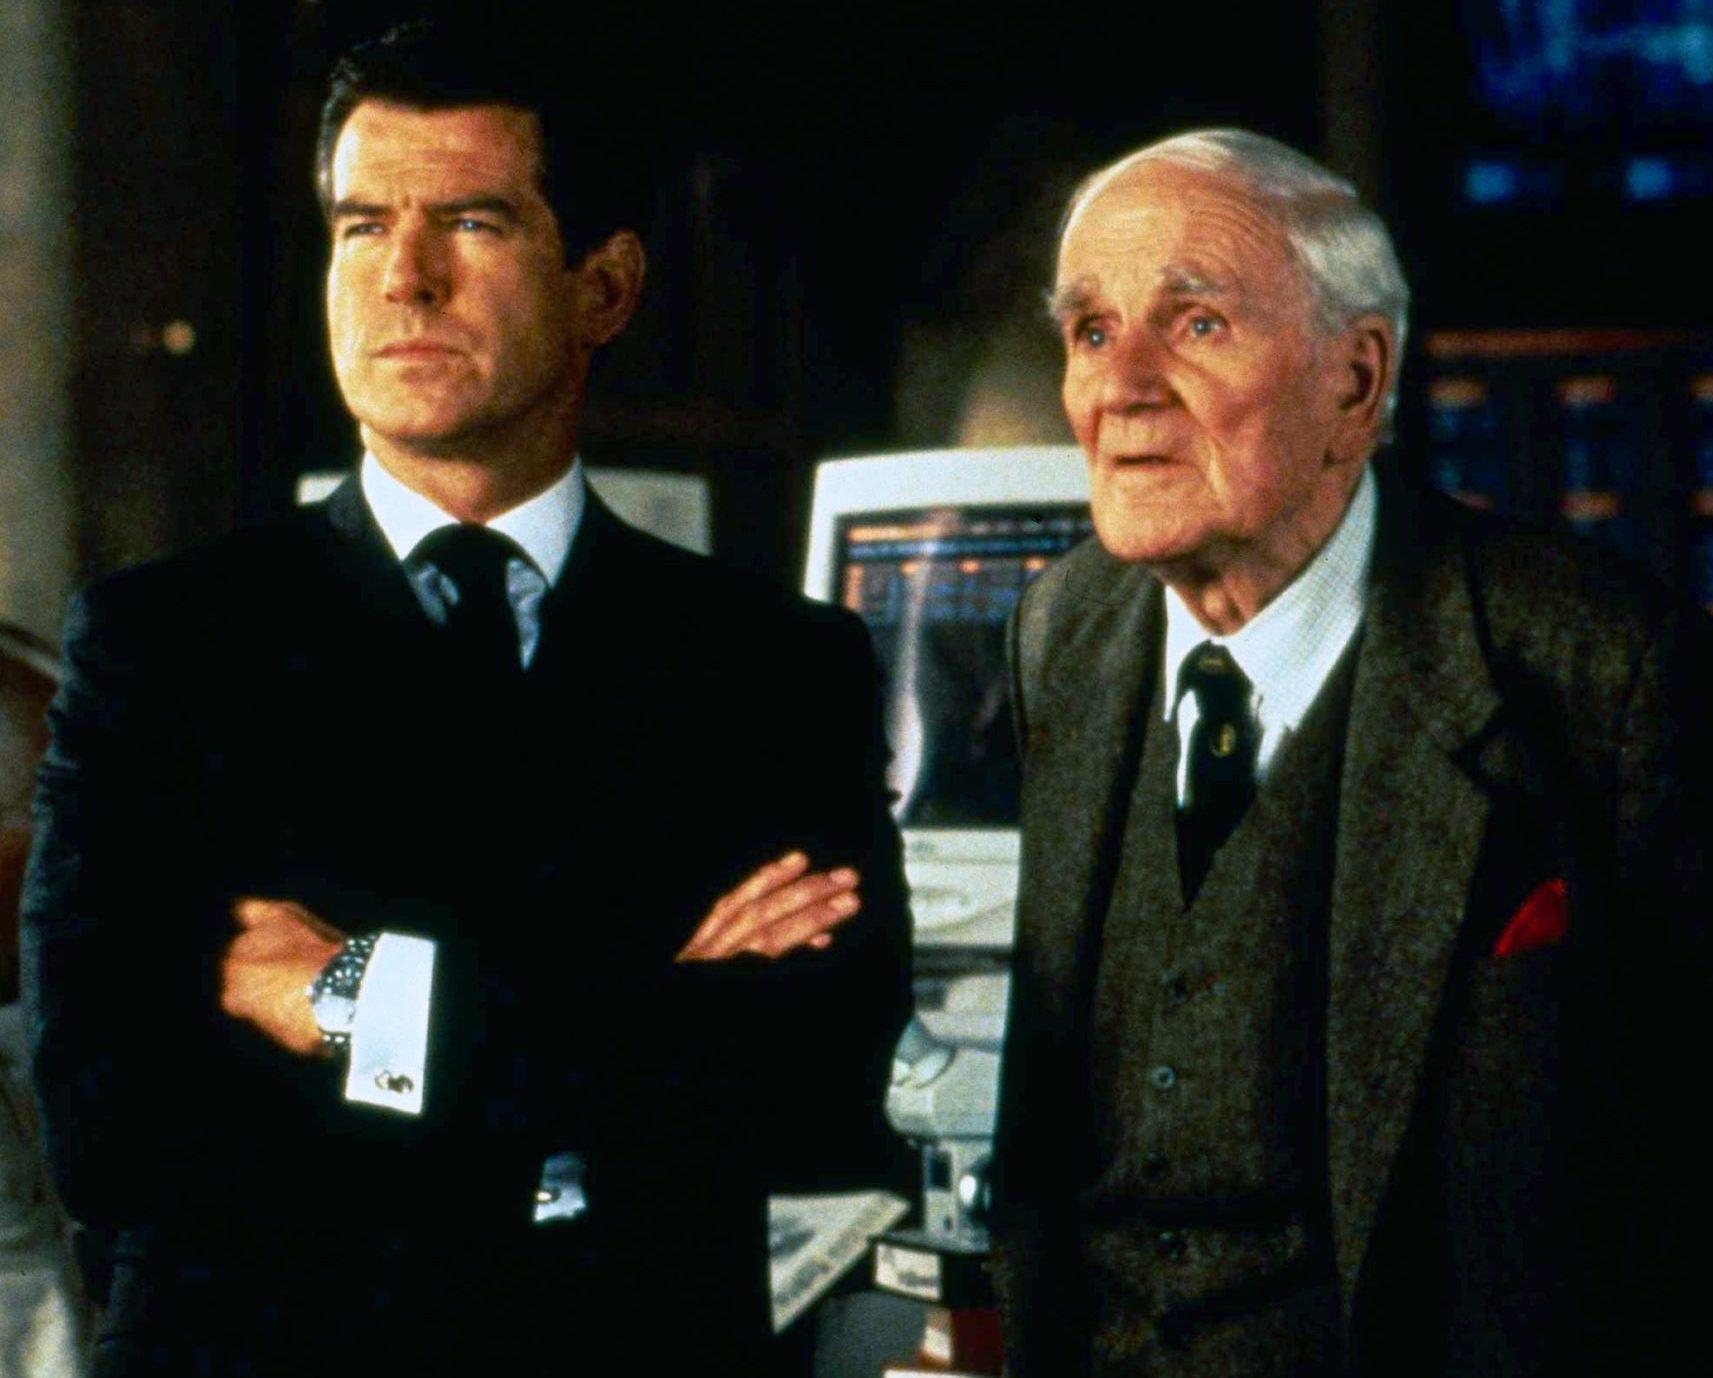 c509a6e192264fcc25975a30268cad3a e1615380485376 30 Things You Probably Didn't Know About The James Bond Films